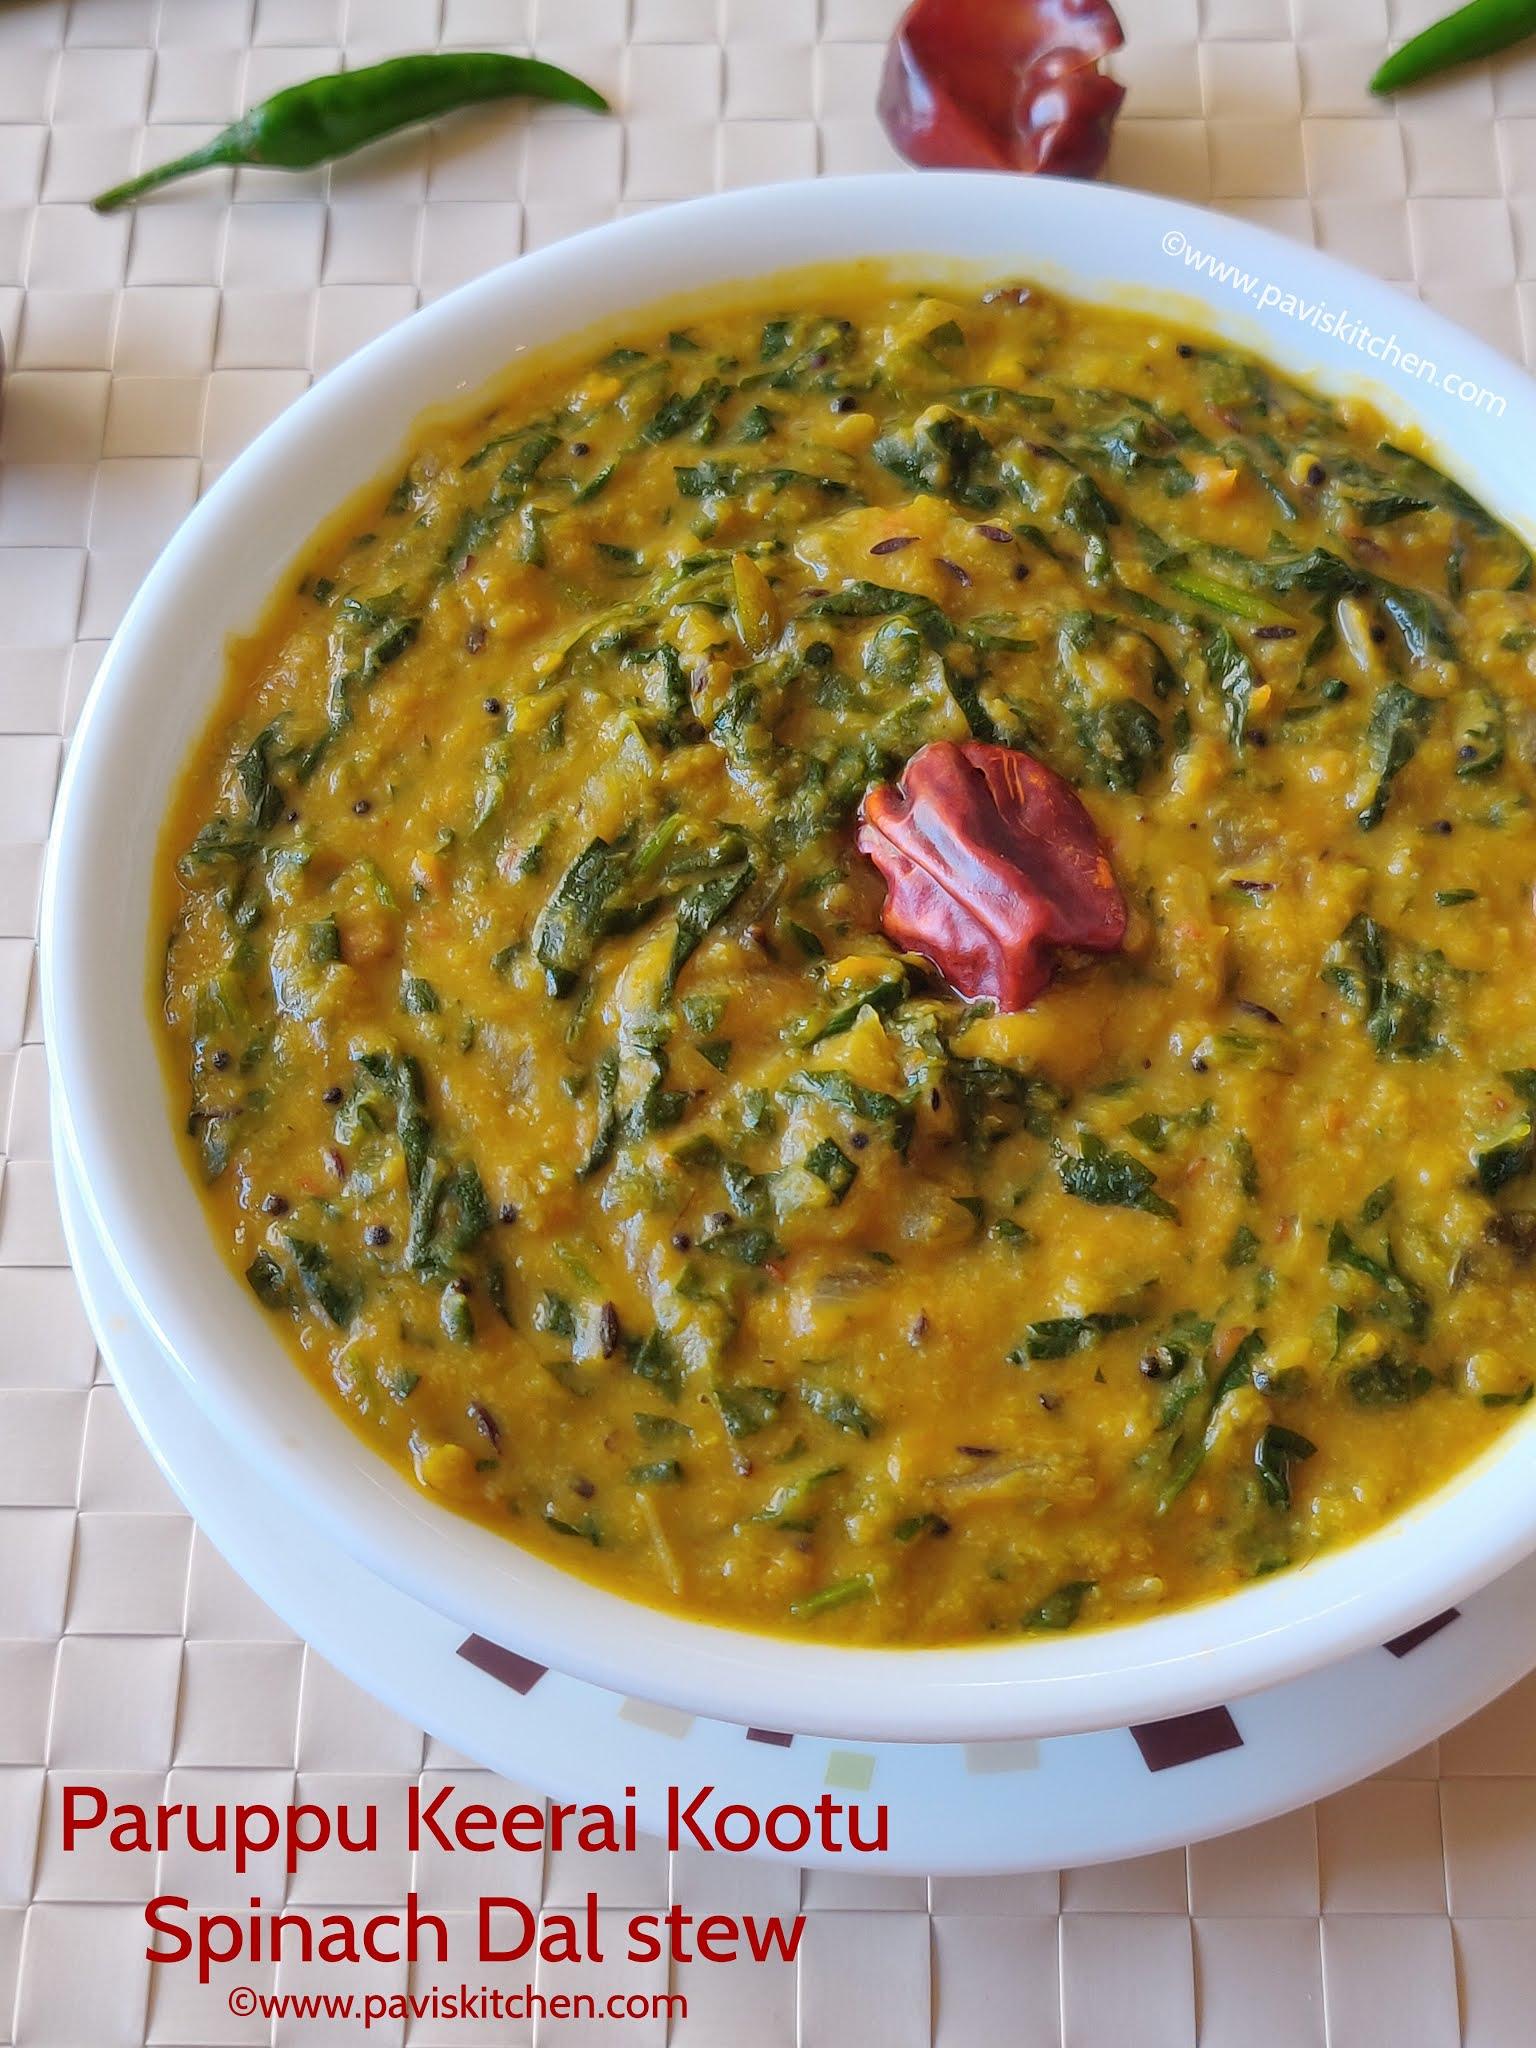 Paruppu keerai kootu recipe | Paruppu keerai masiyal | keerai molagootal | Spinach moong dal stew